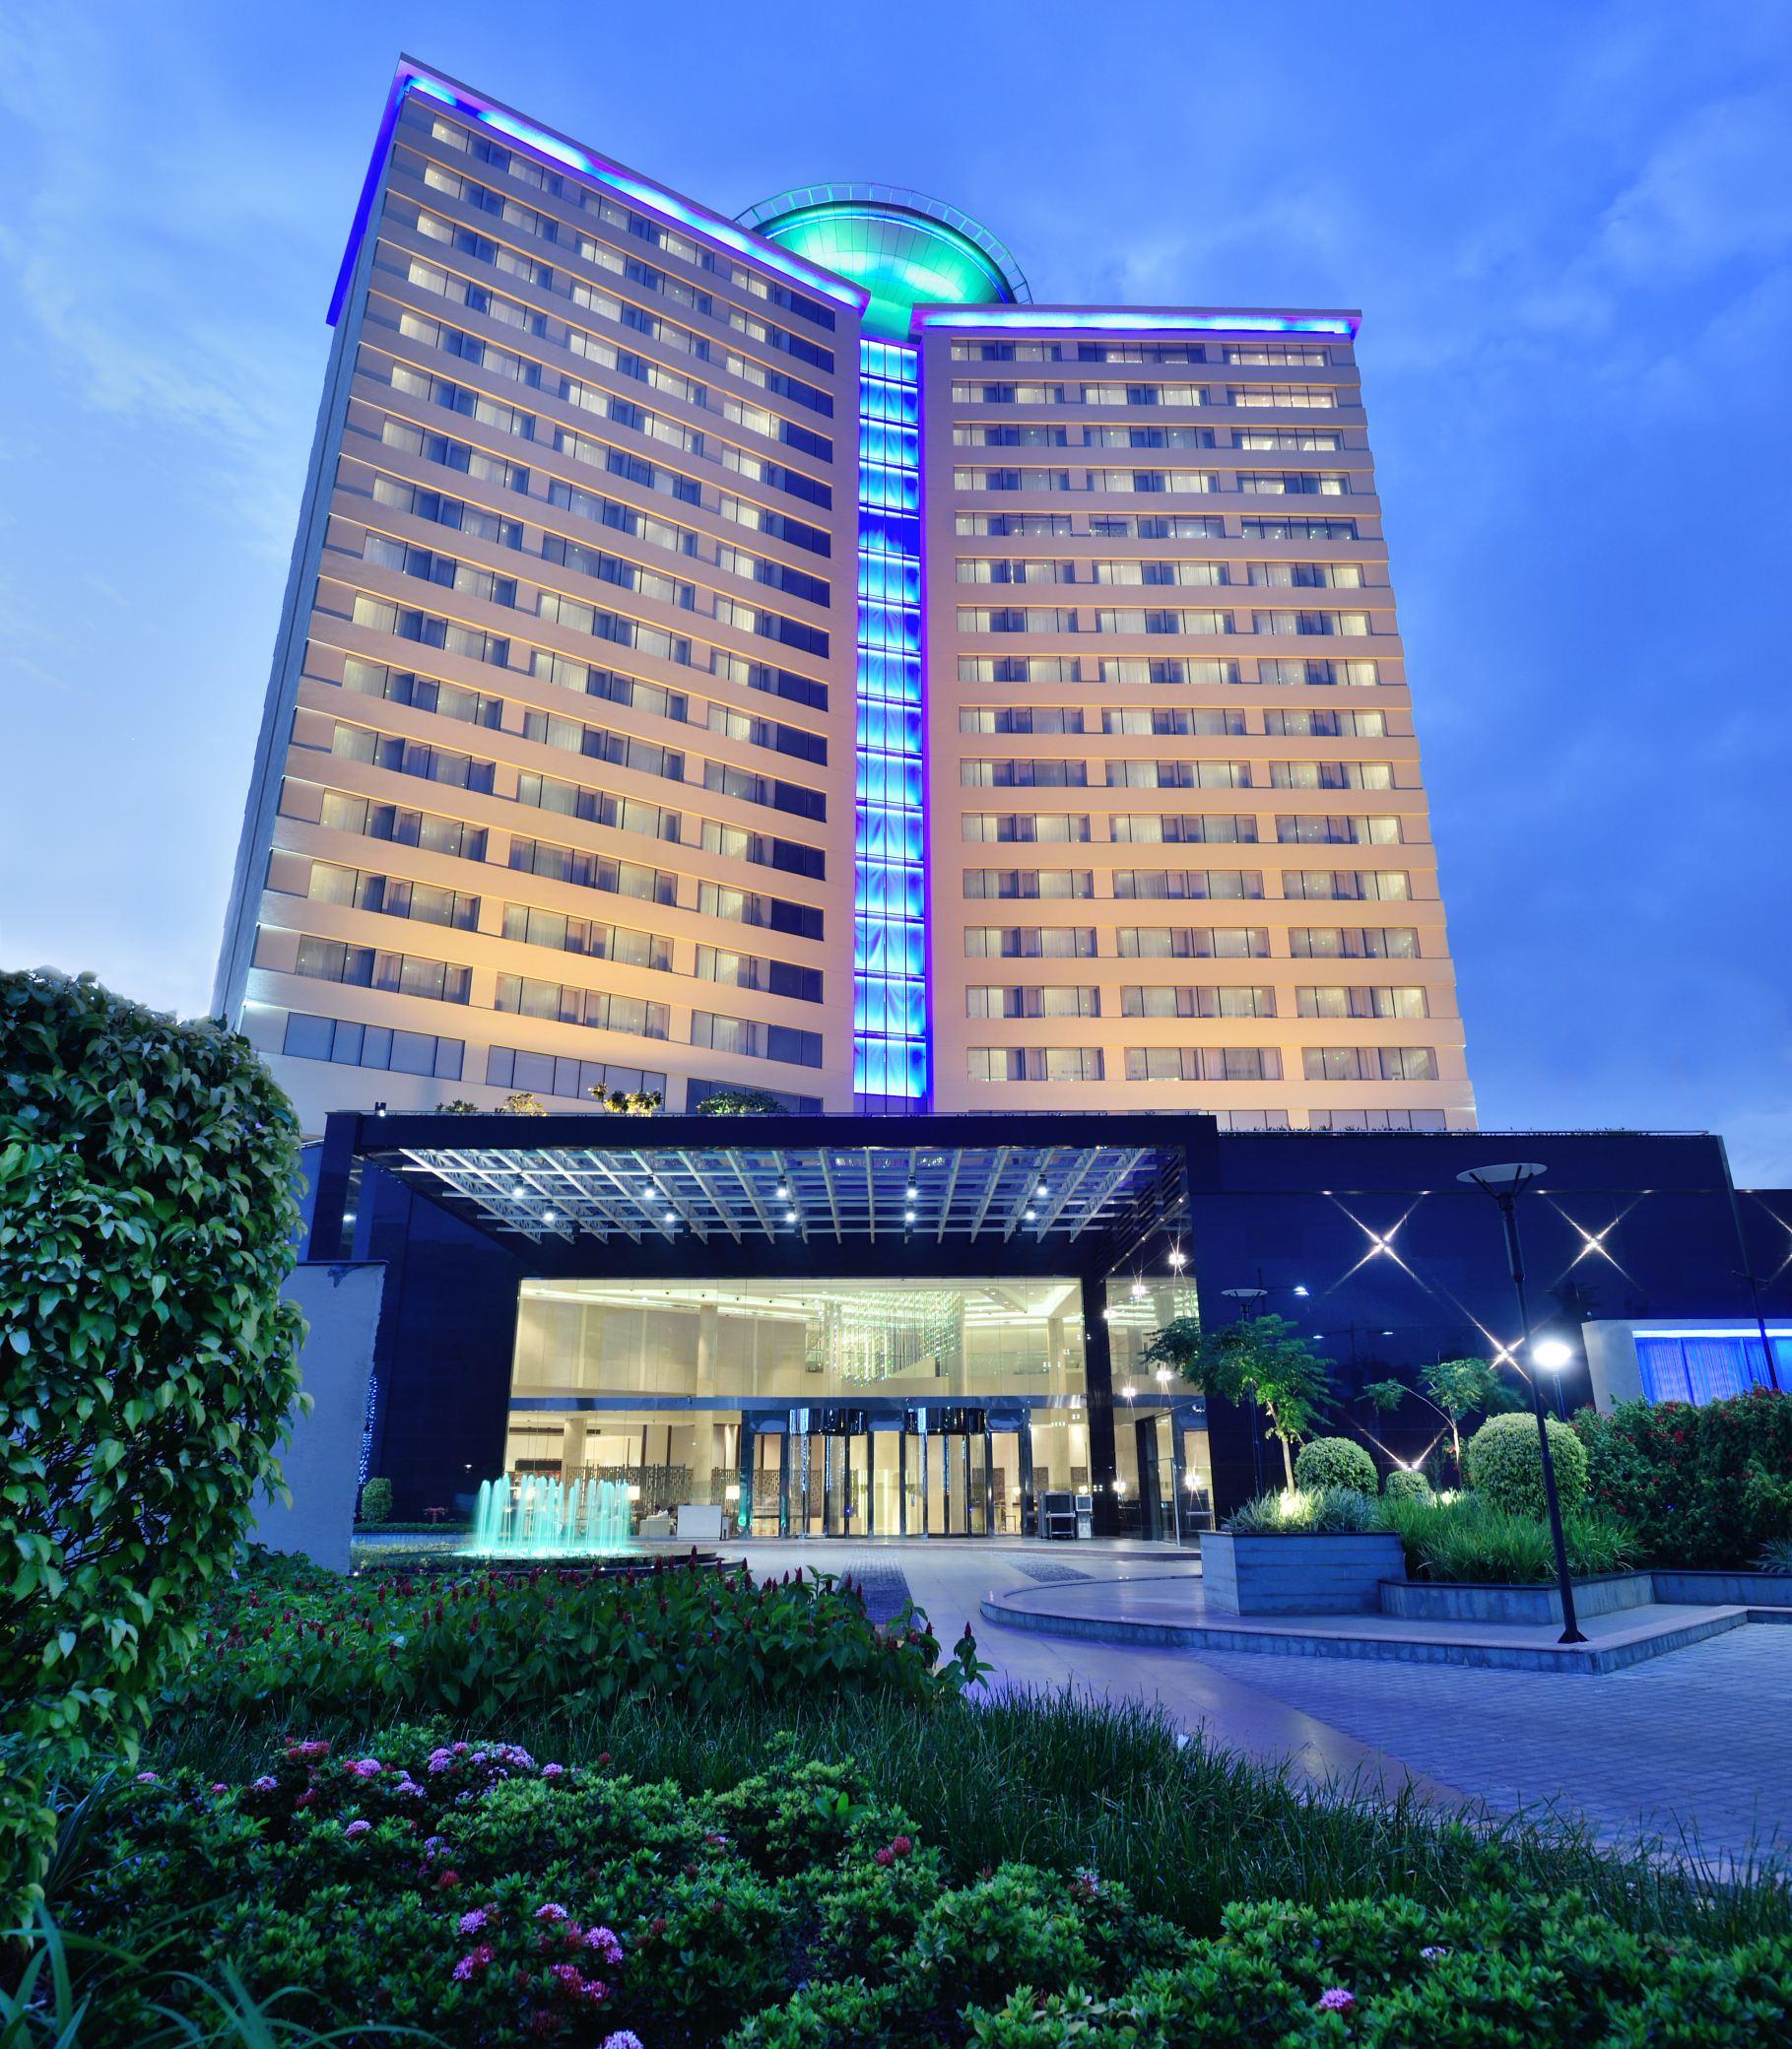 Kochi Marriott Hotel - Ernakulam Image